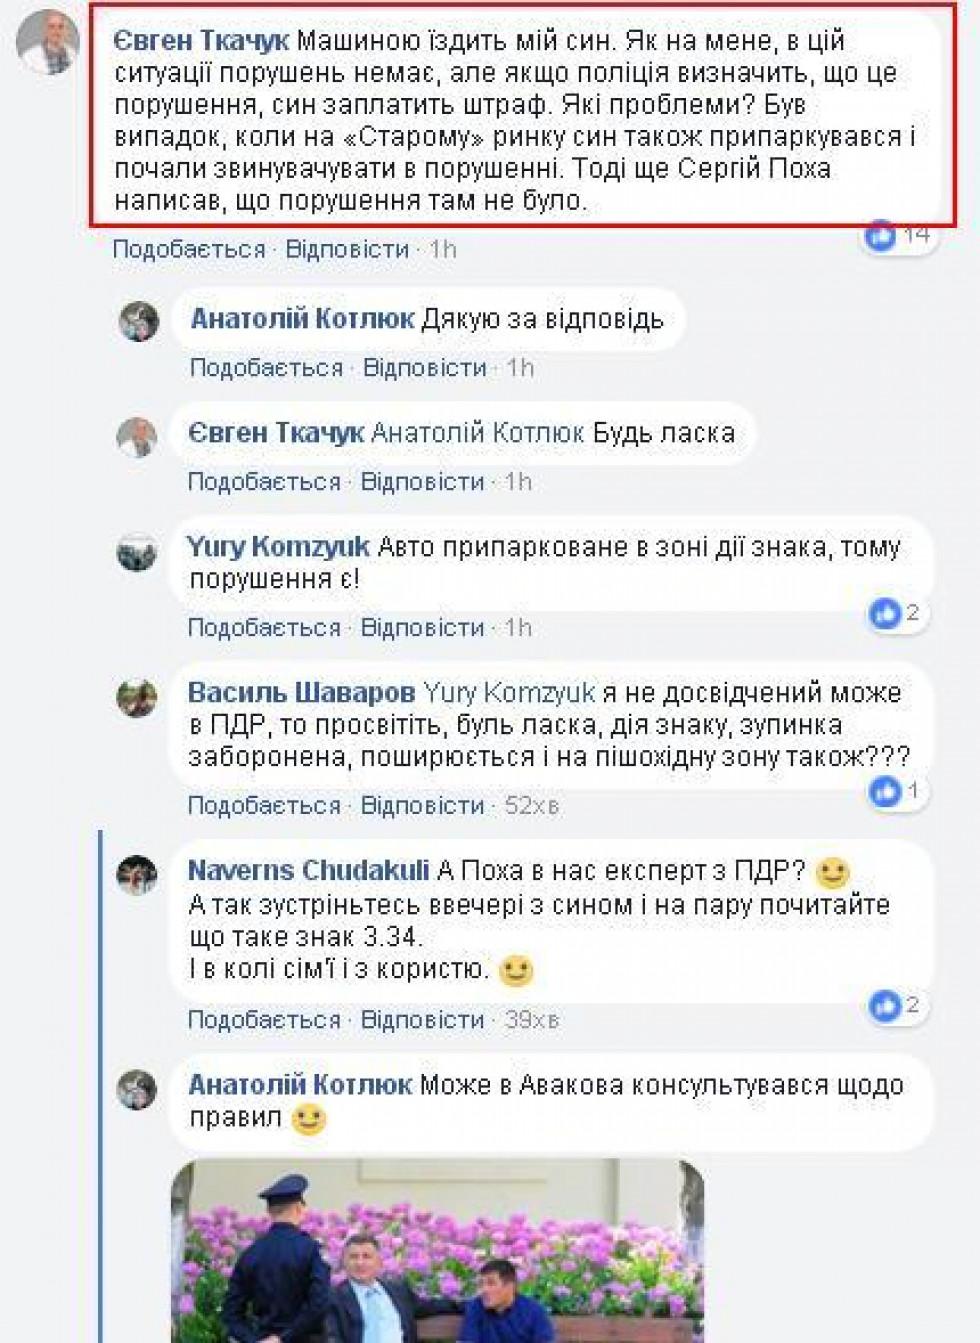 Коментар Ткачука